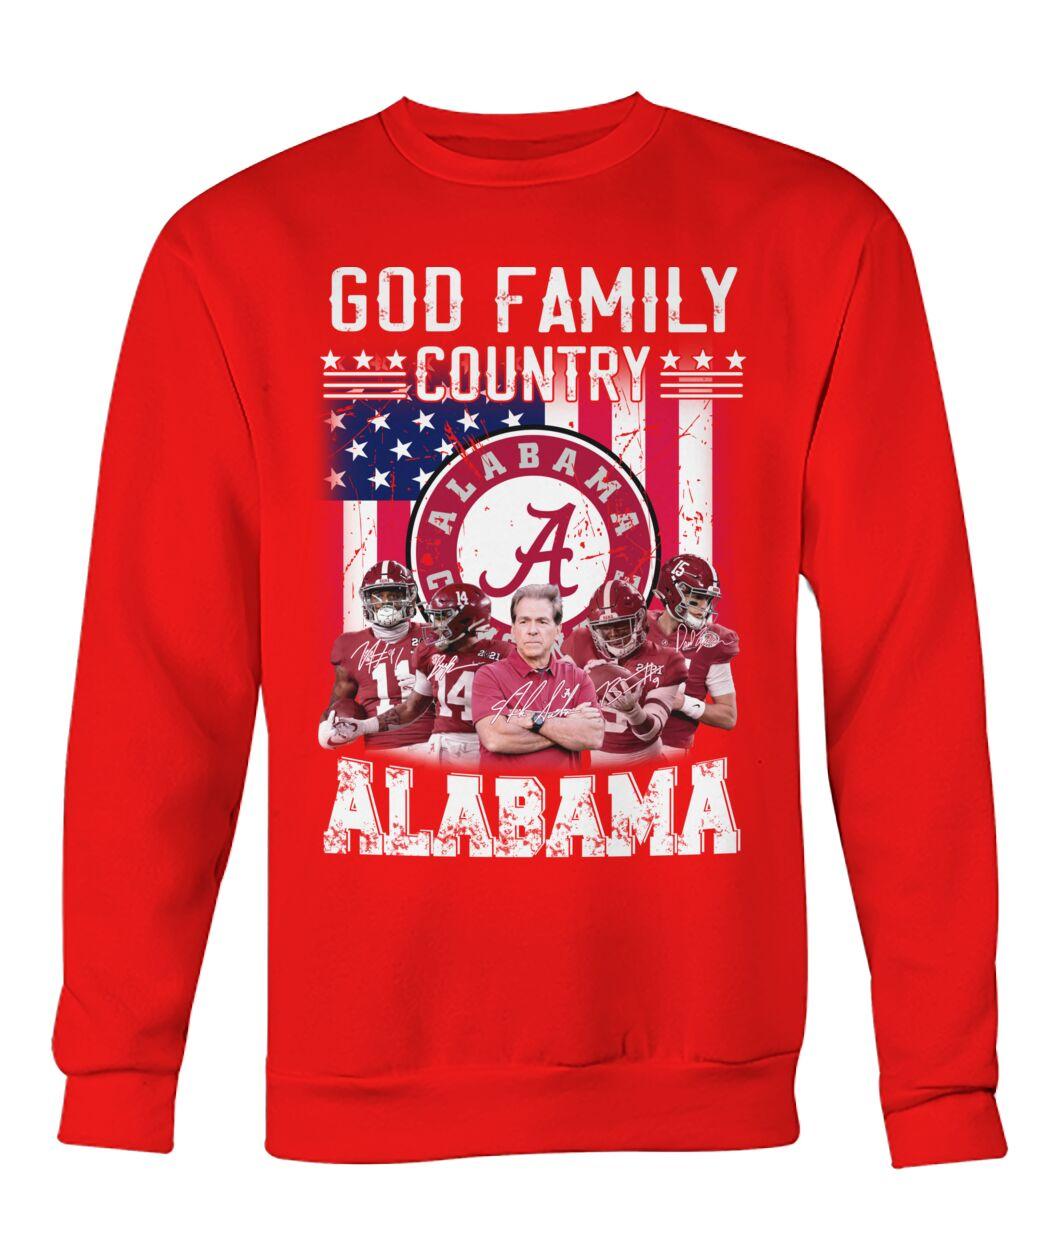 God family country Alabama crimson tide american flag sweatshirt